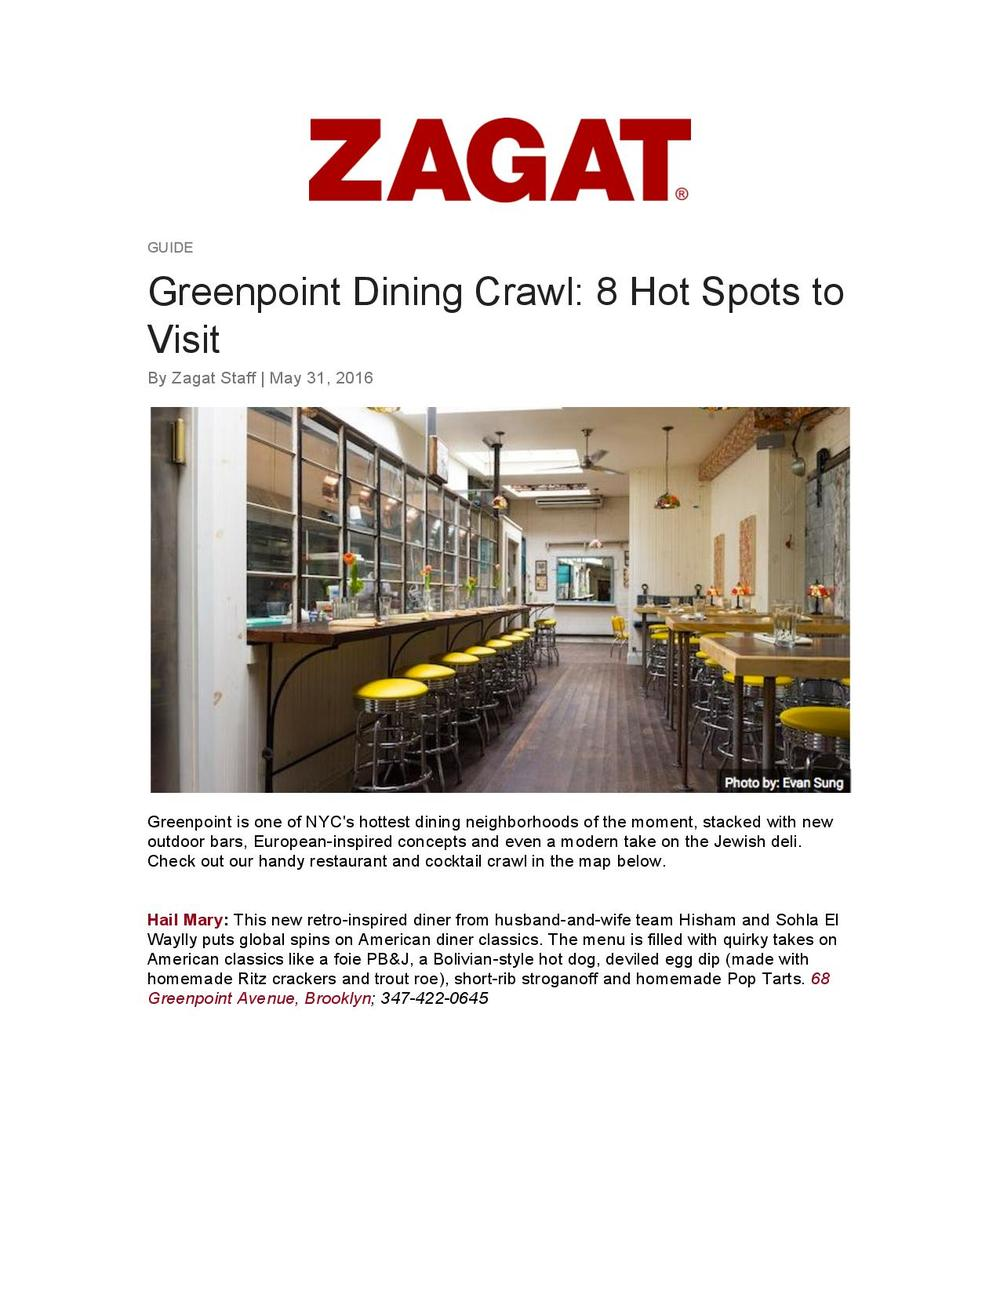 Zagat_HailMary_053116-page-001.jpg